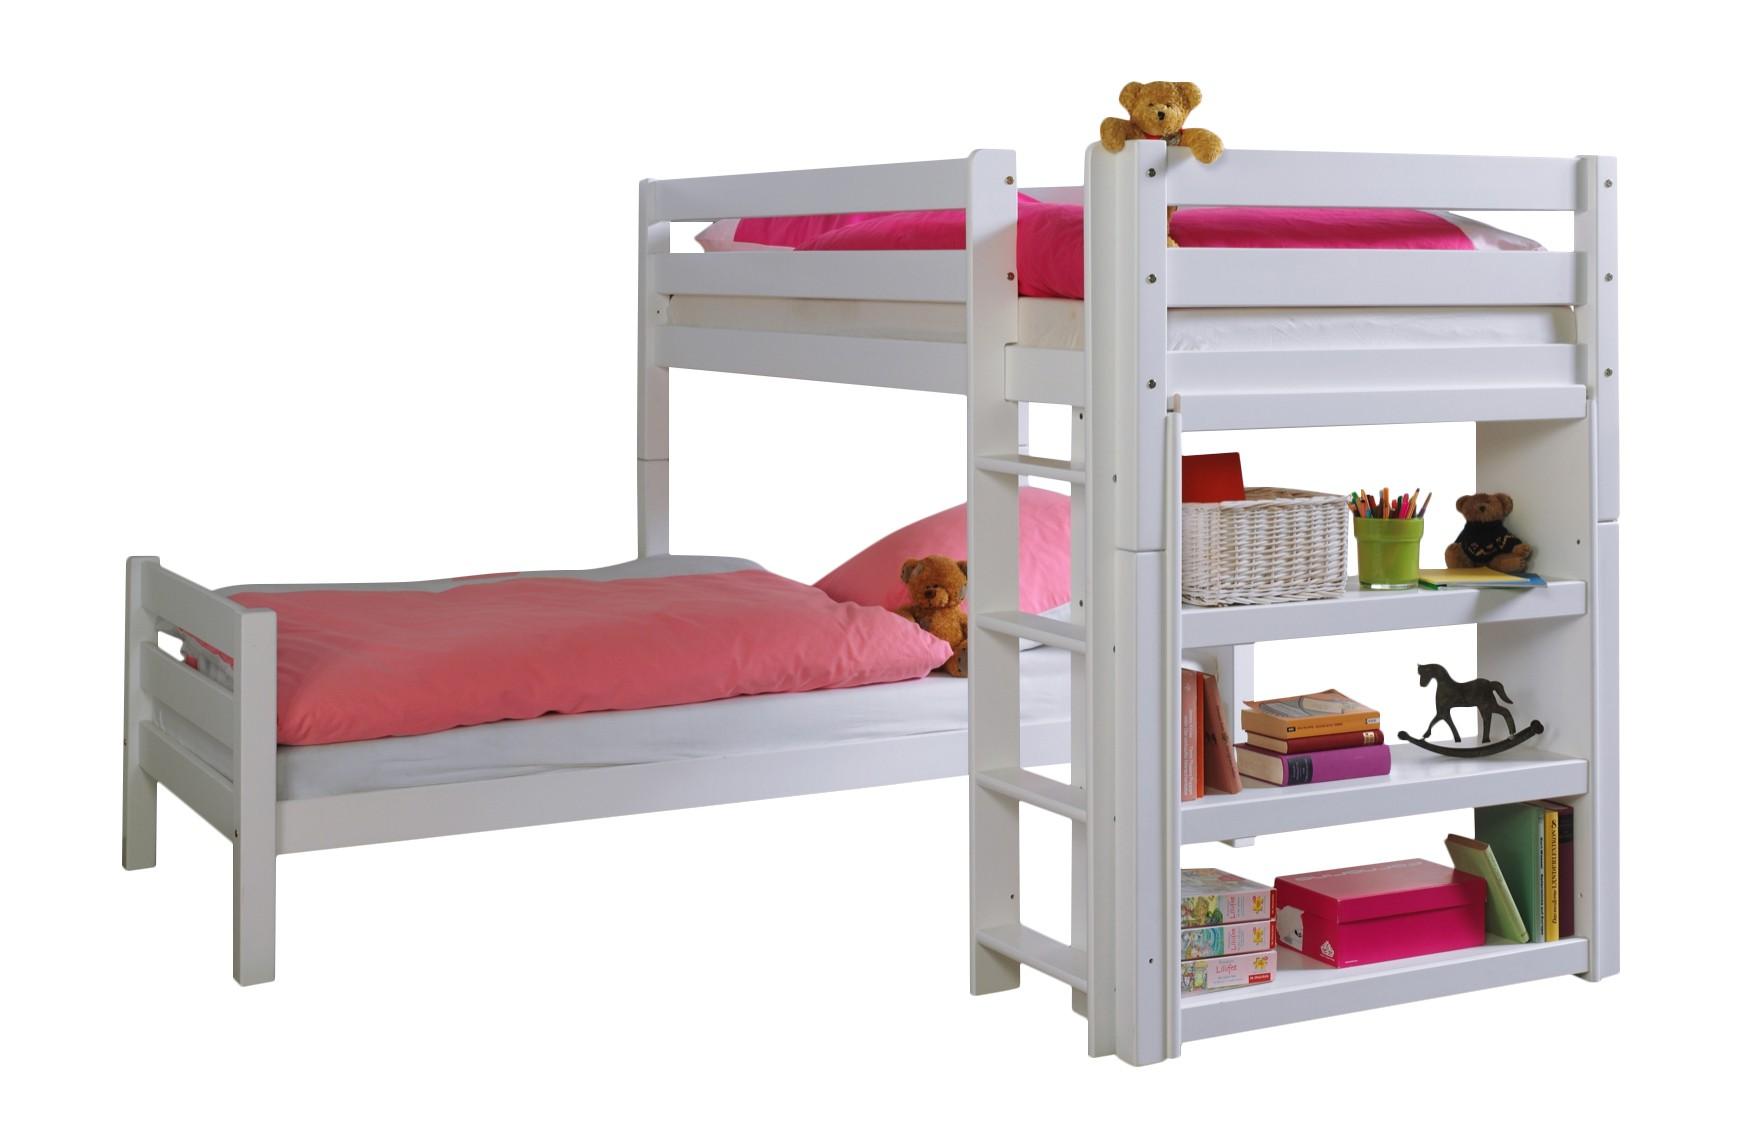 White Beech L Shaped Bunk Bed For 90x200 Mattresses With Shelves Rigid Slats 60 18 09wm Beni L Ceres Webshop